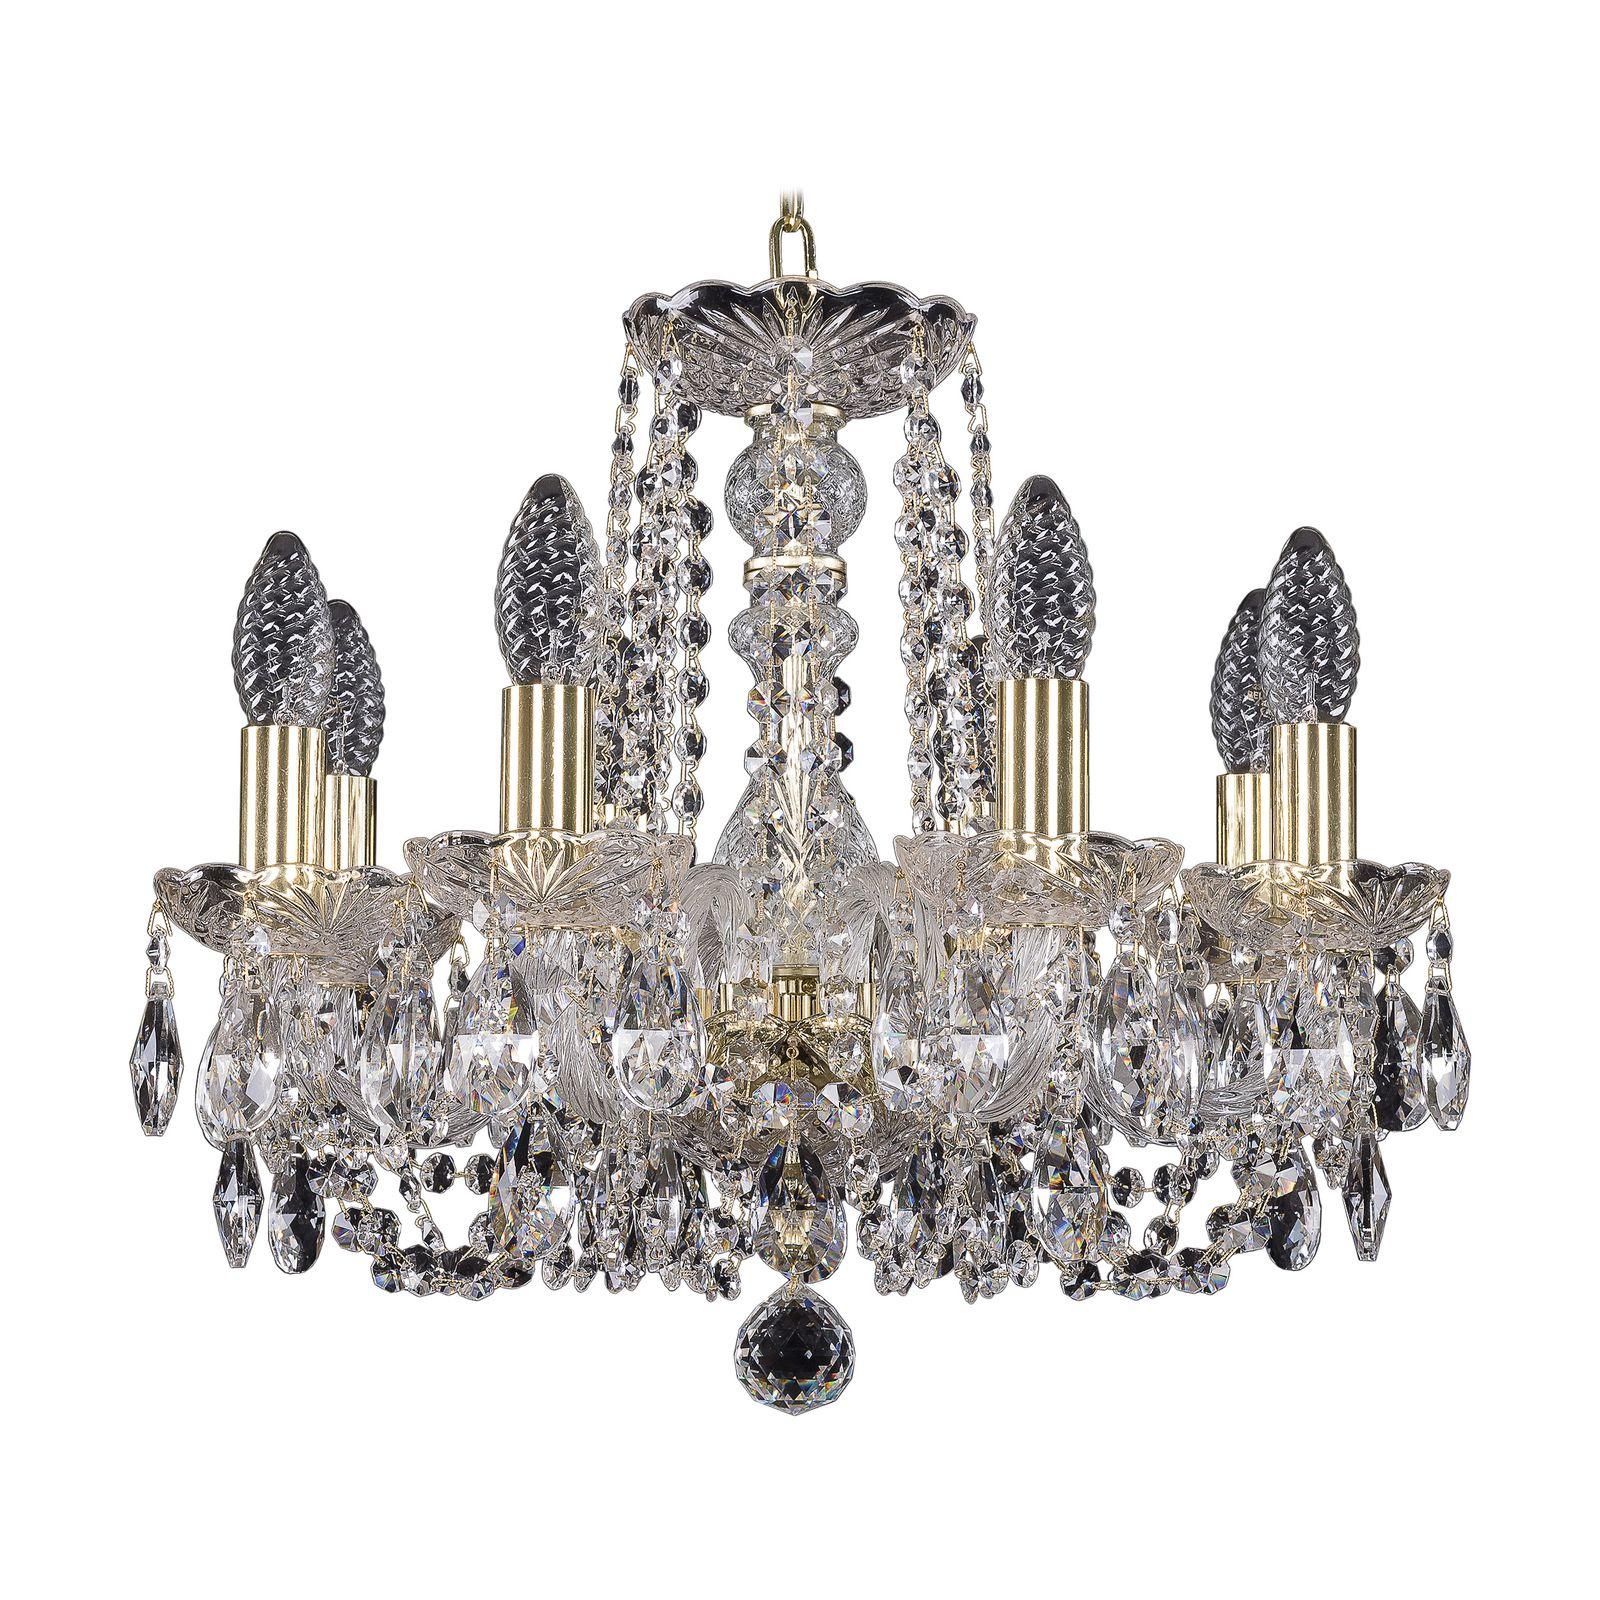 Потолочный светильник Bohemia Ivele Crystal 1402/8/141 G, E14, 40 Вт bohemia ivele crystal 1932 75z g